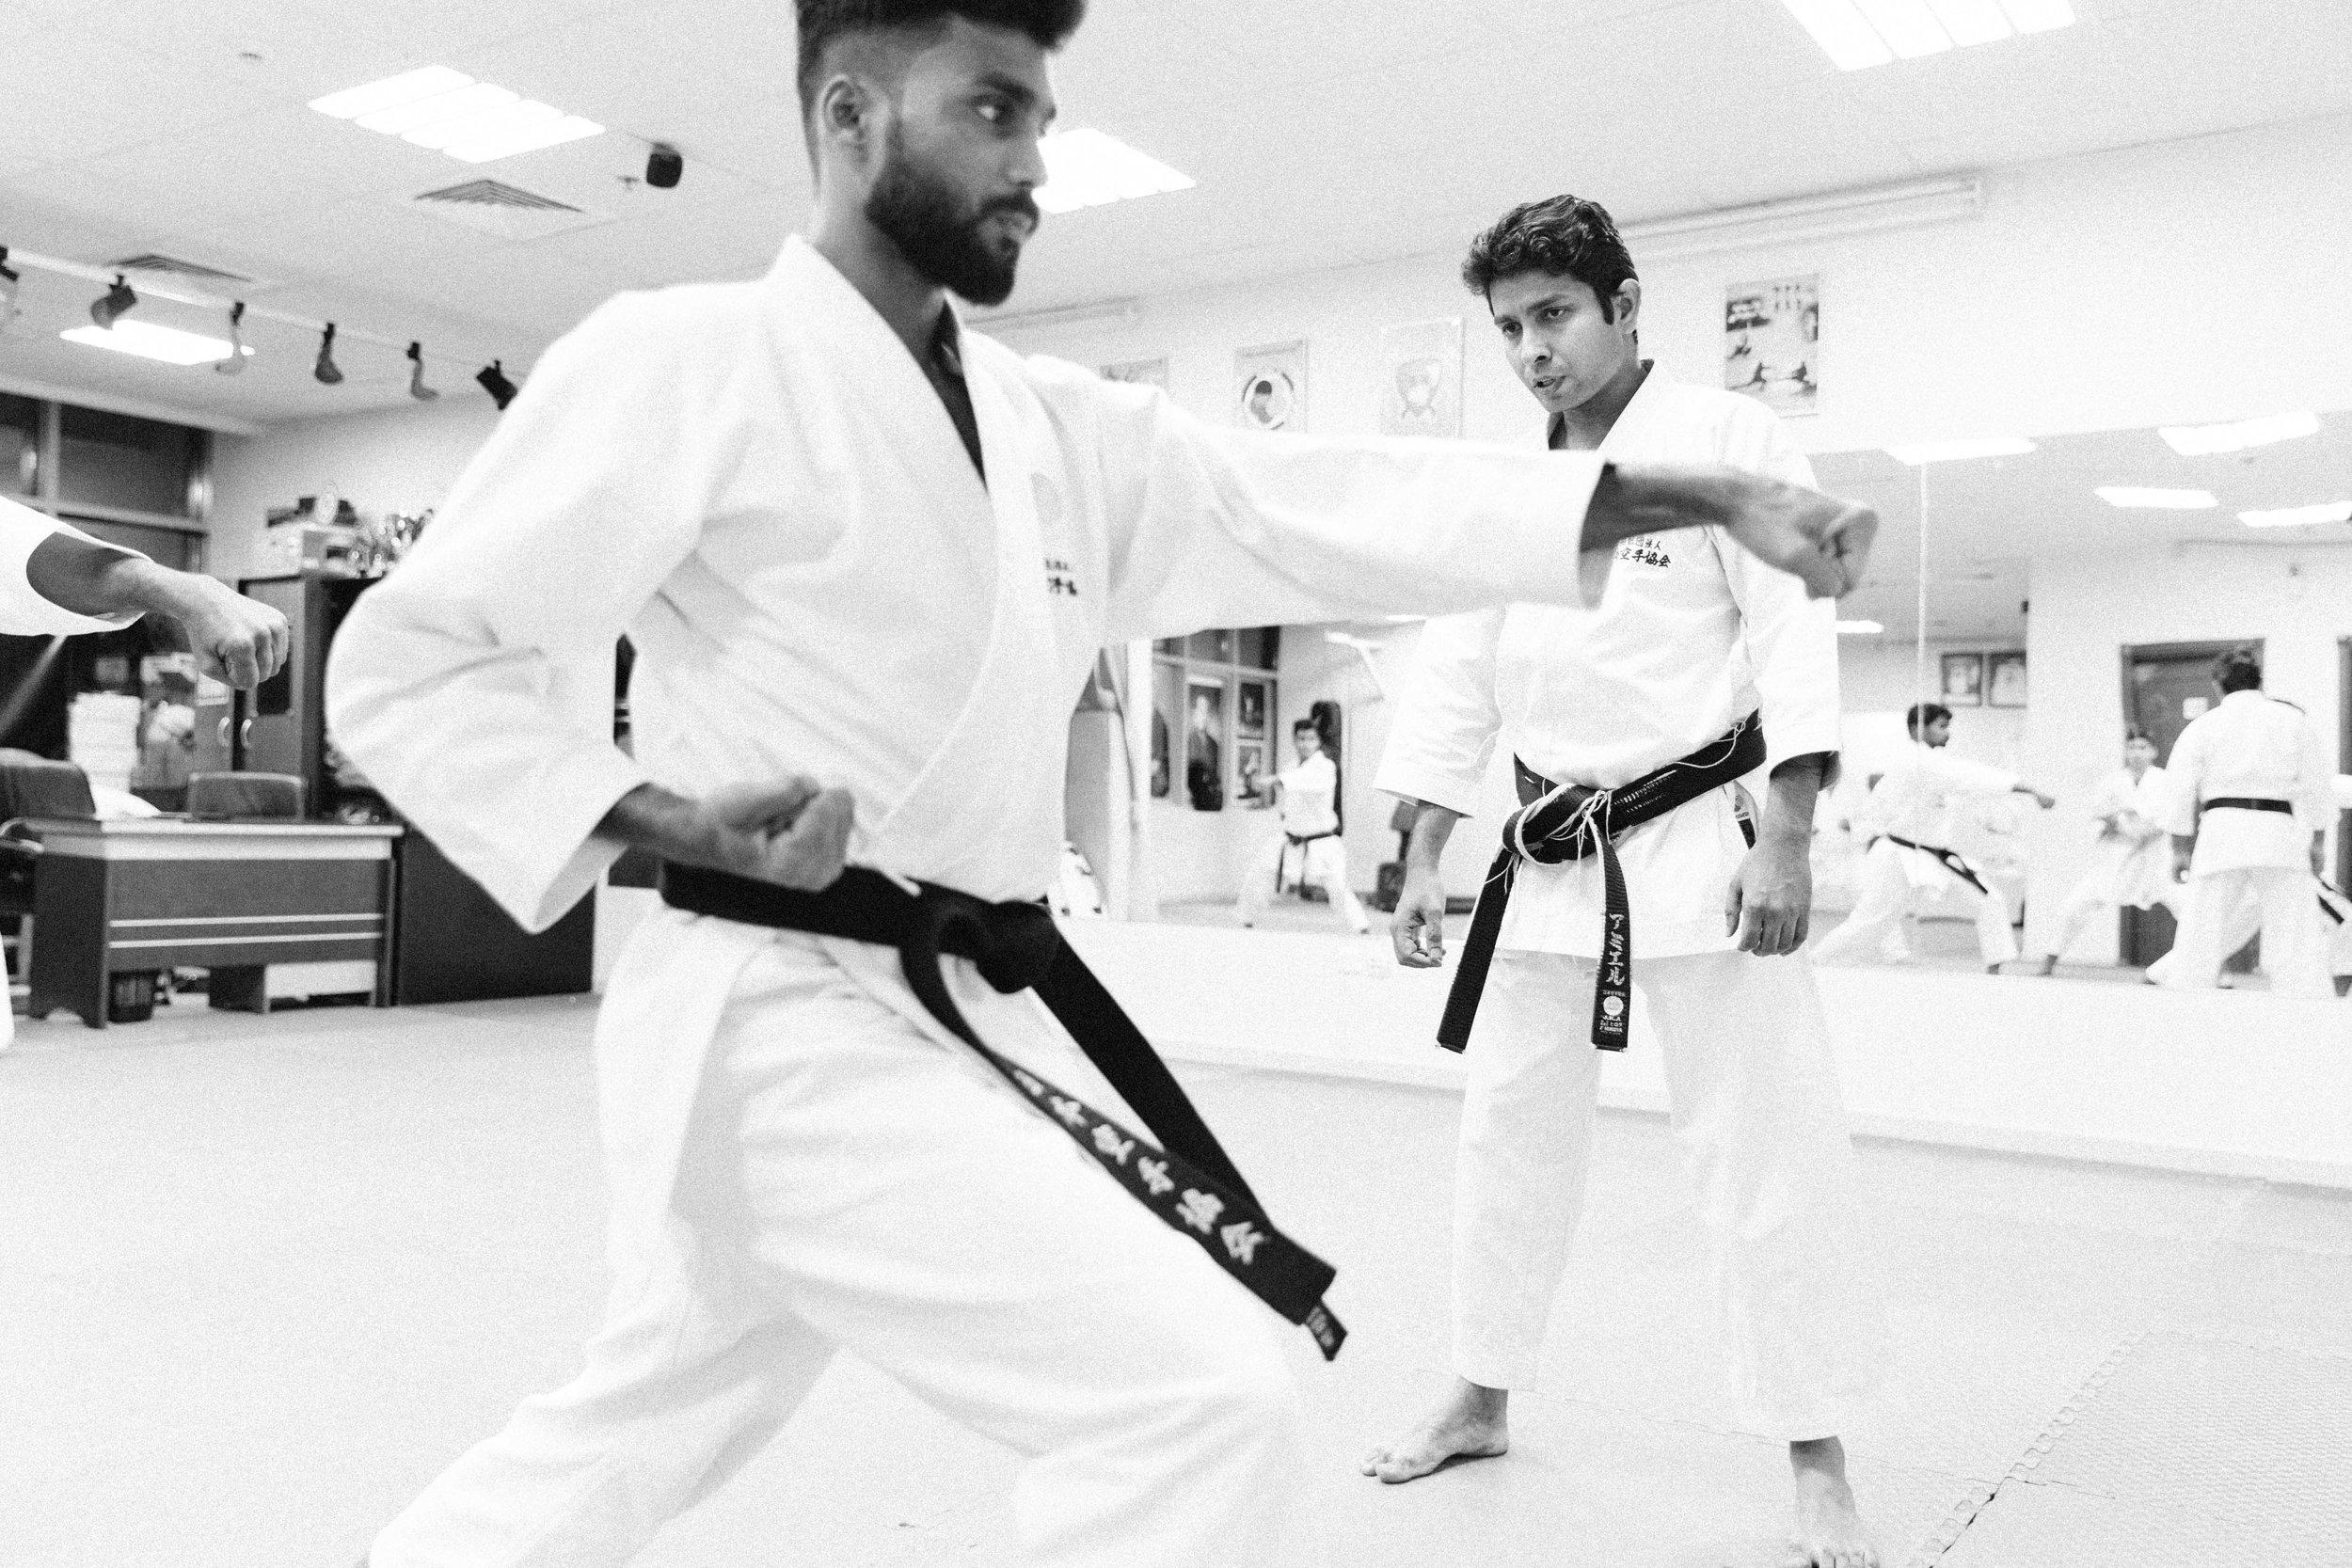 ShotokanKarate_AlQusais_2018-284-2.jpg